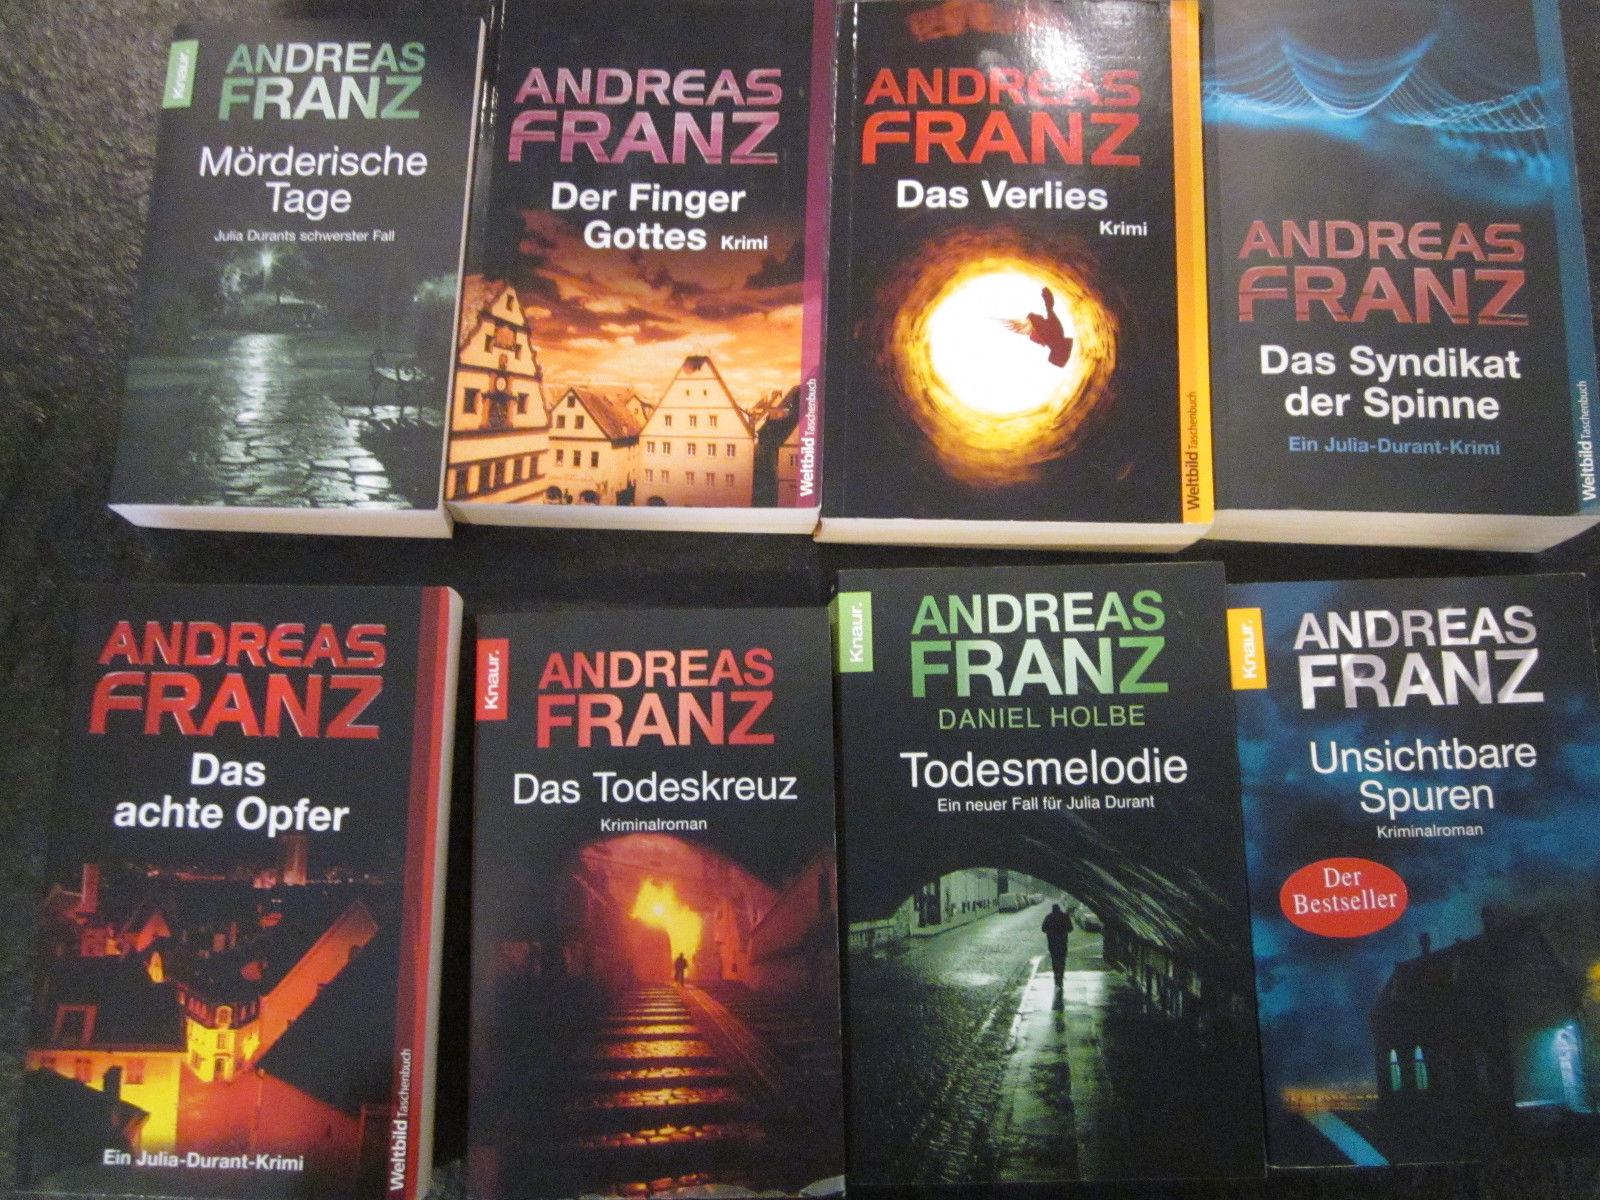 Andreas Franz im 16er Pack